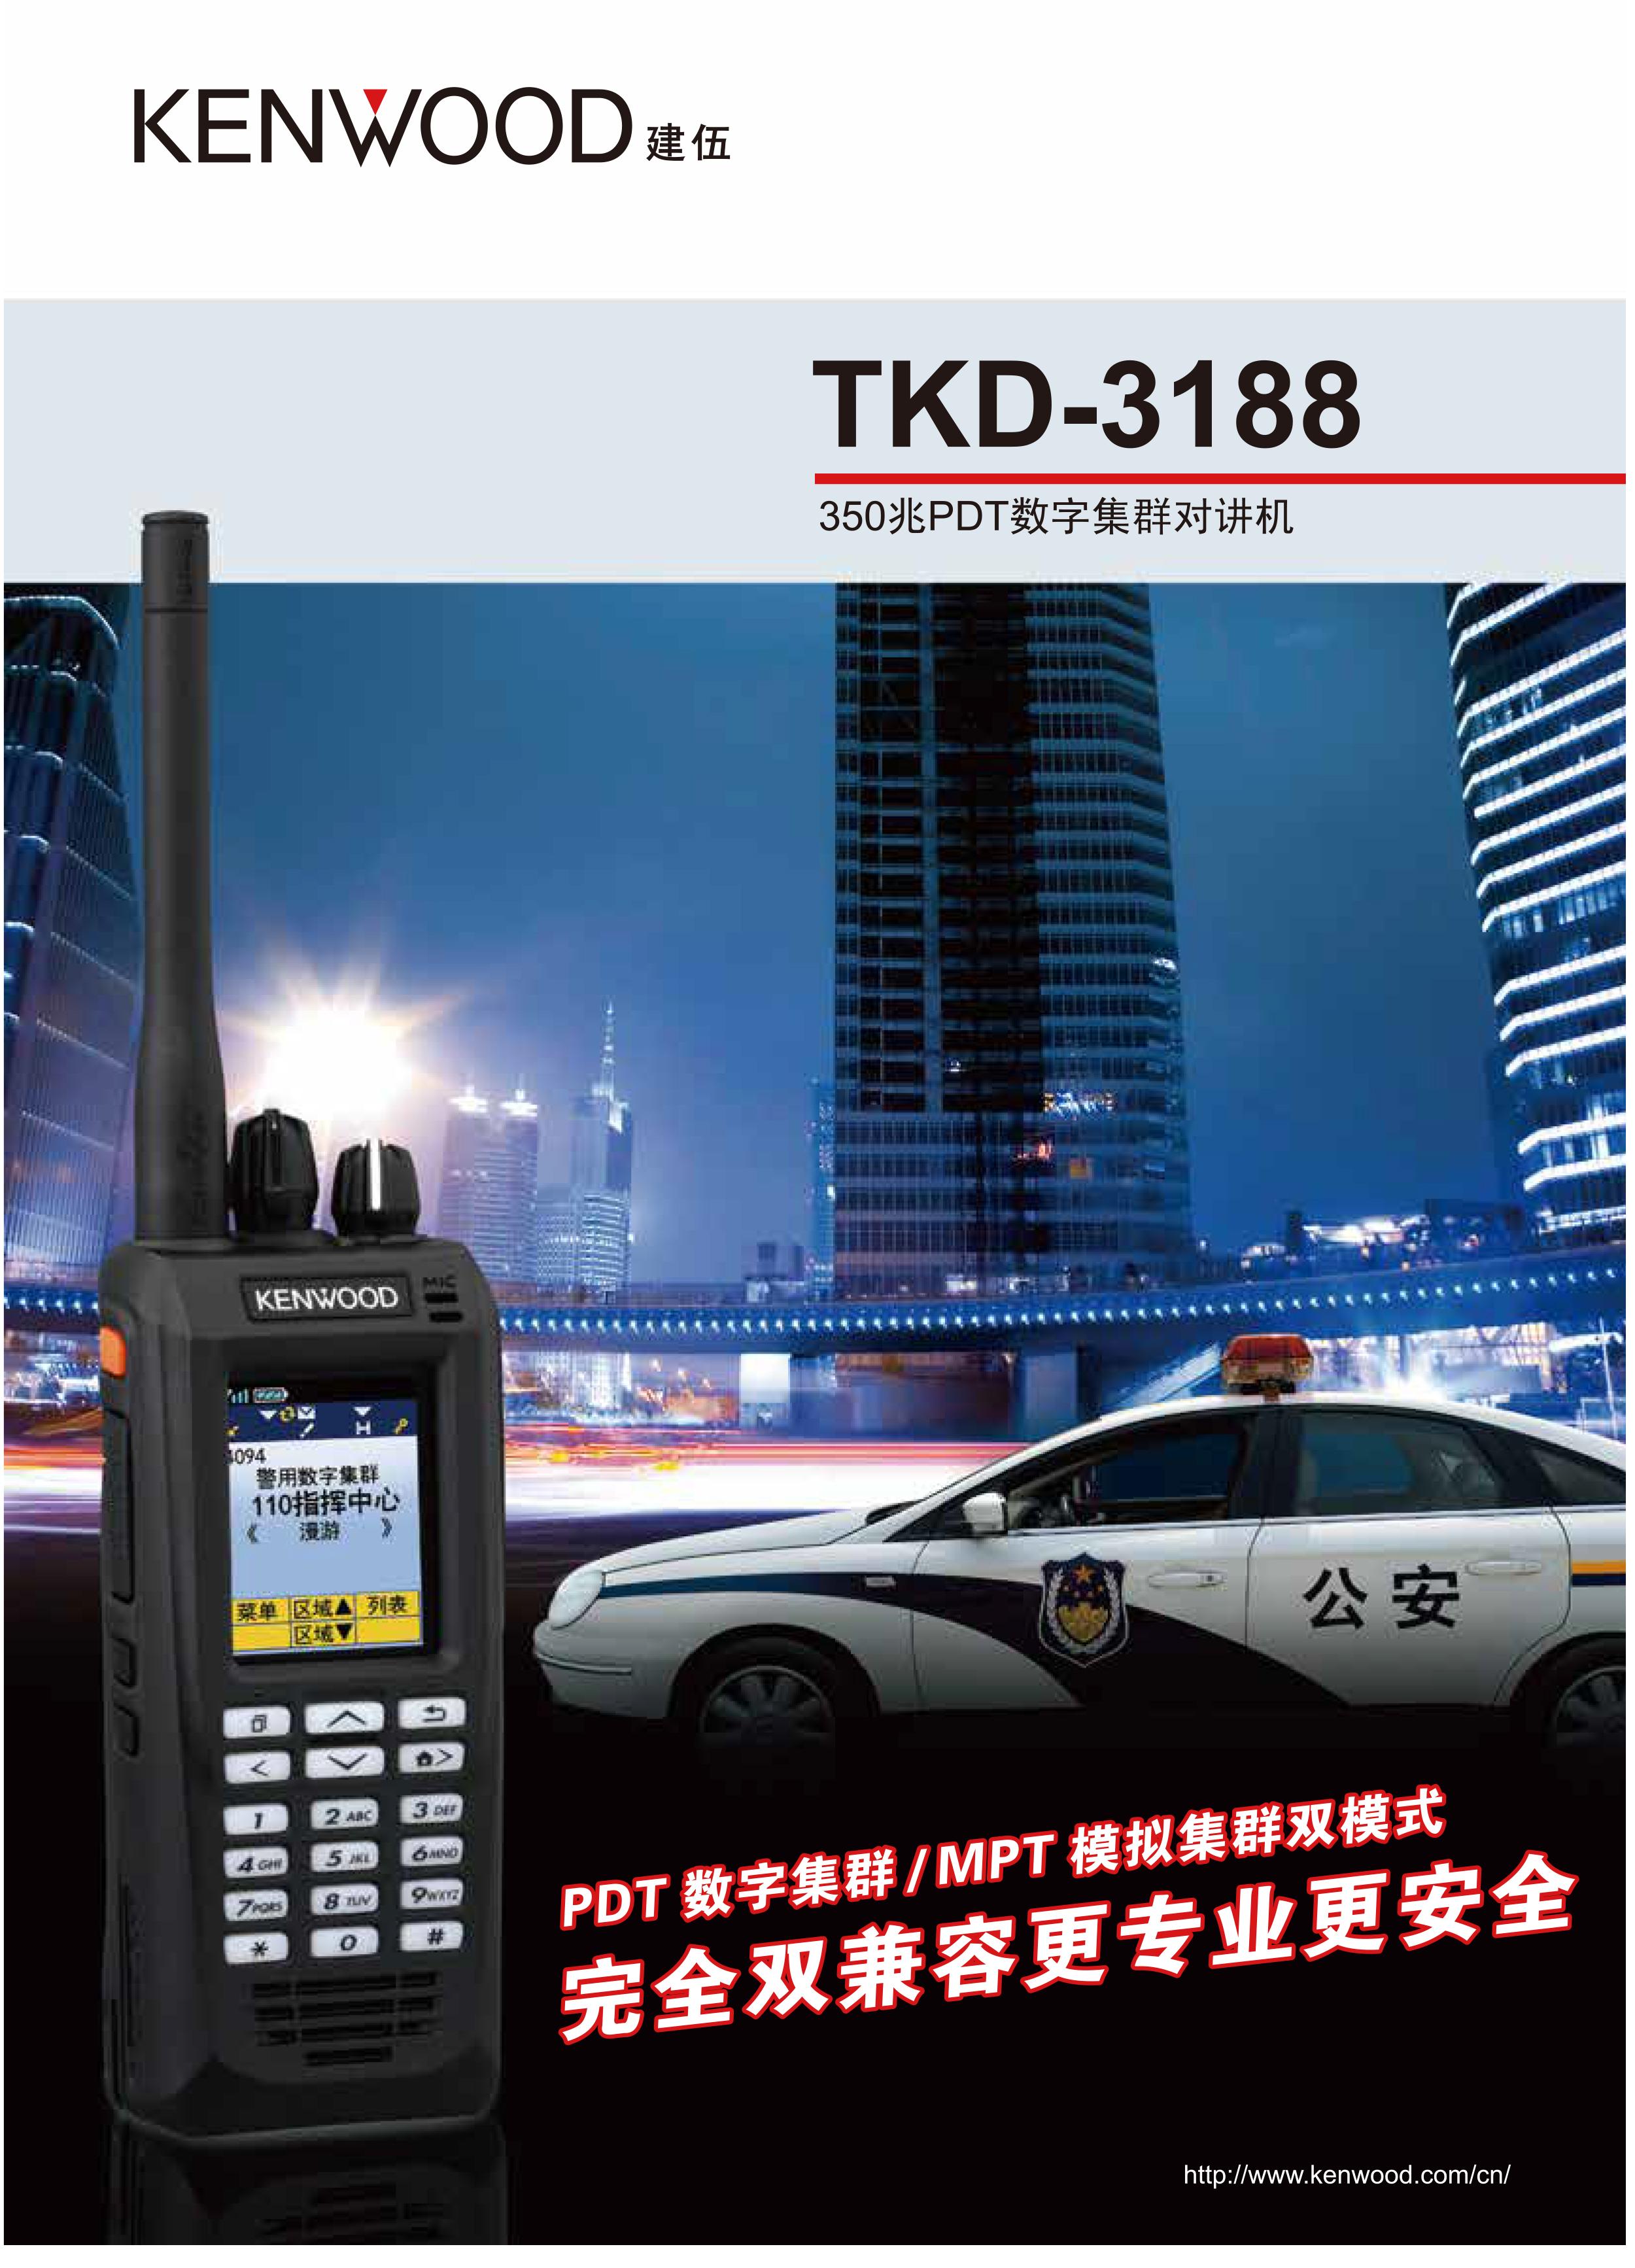 TKD-3188数字对讲机彩页_01